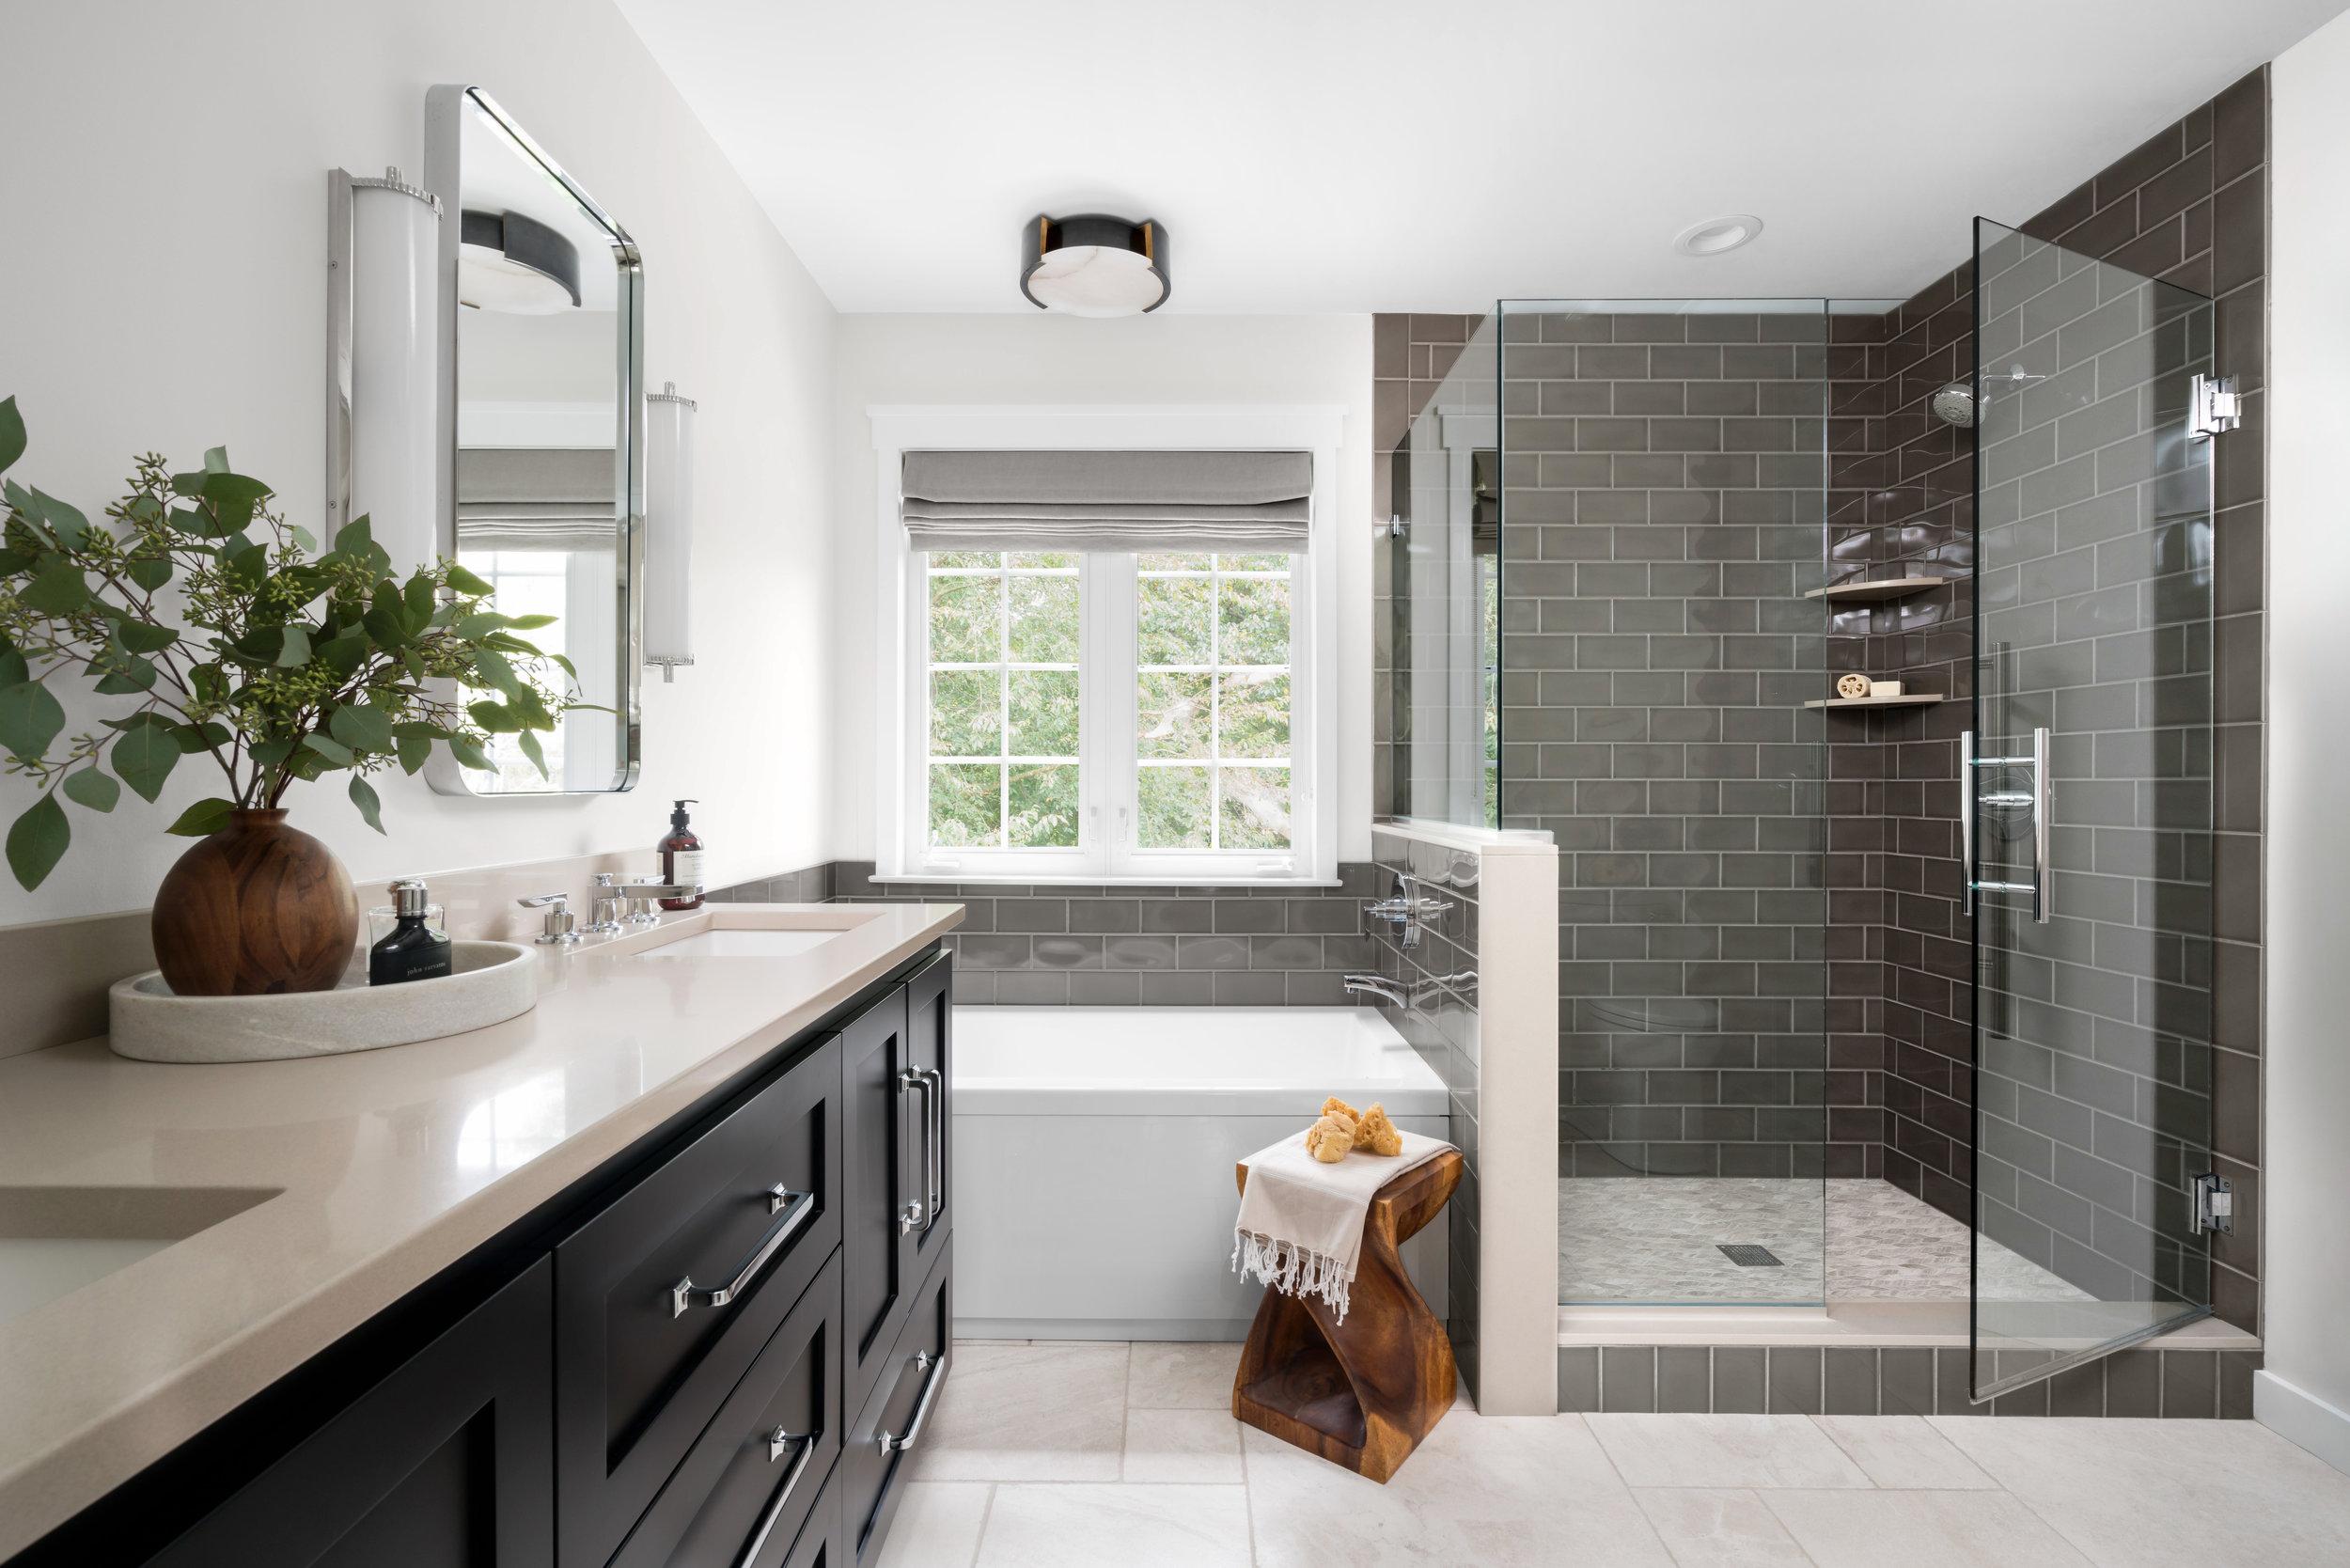 AFTER: Natural stone, tone-on-tone, spa-like master bathroom.